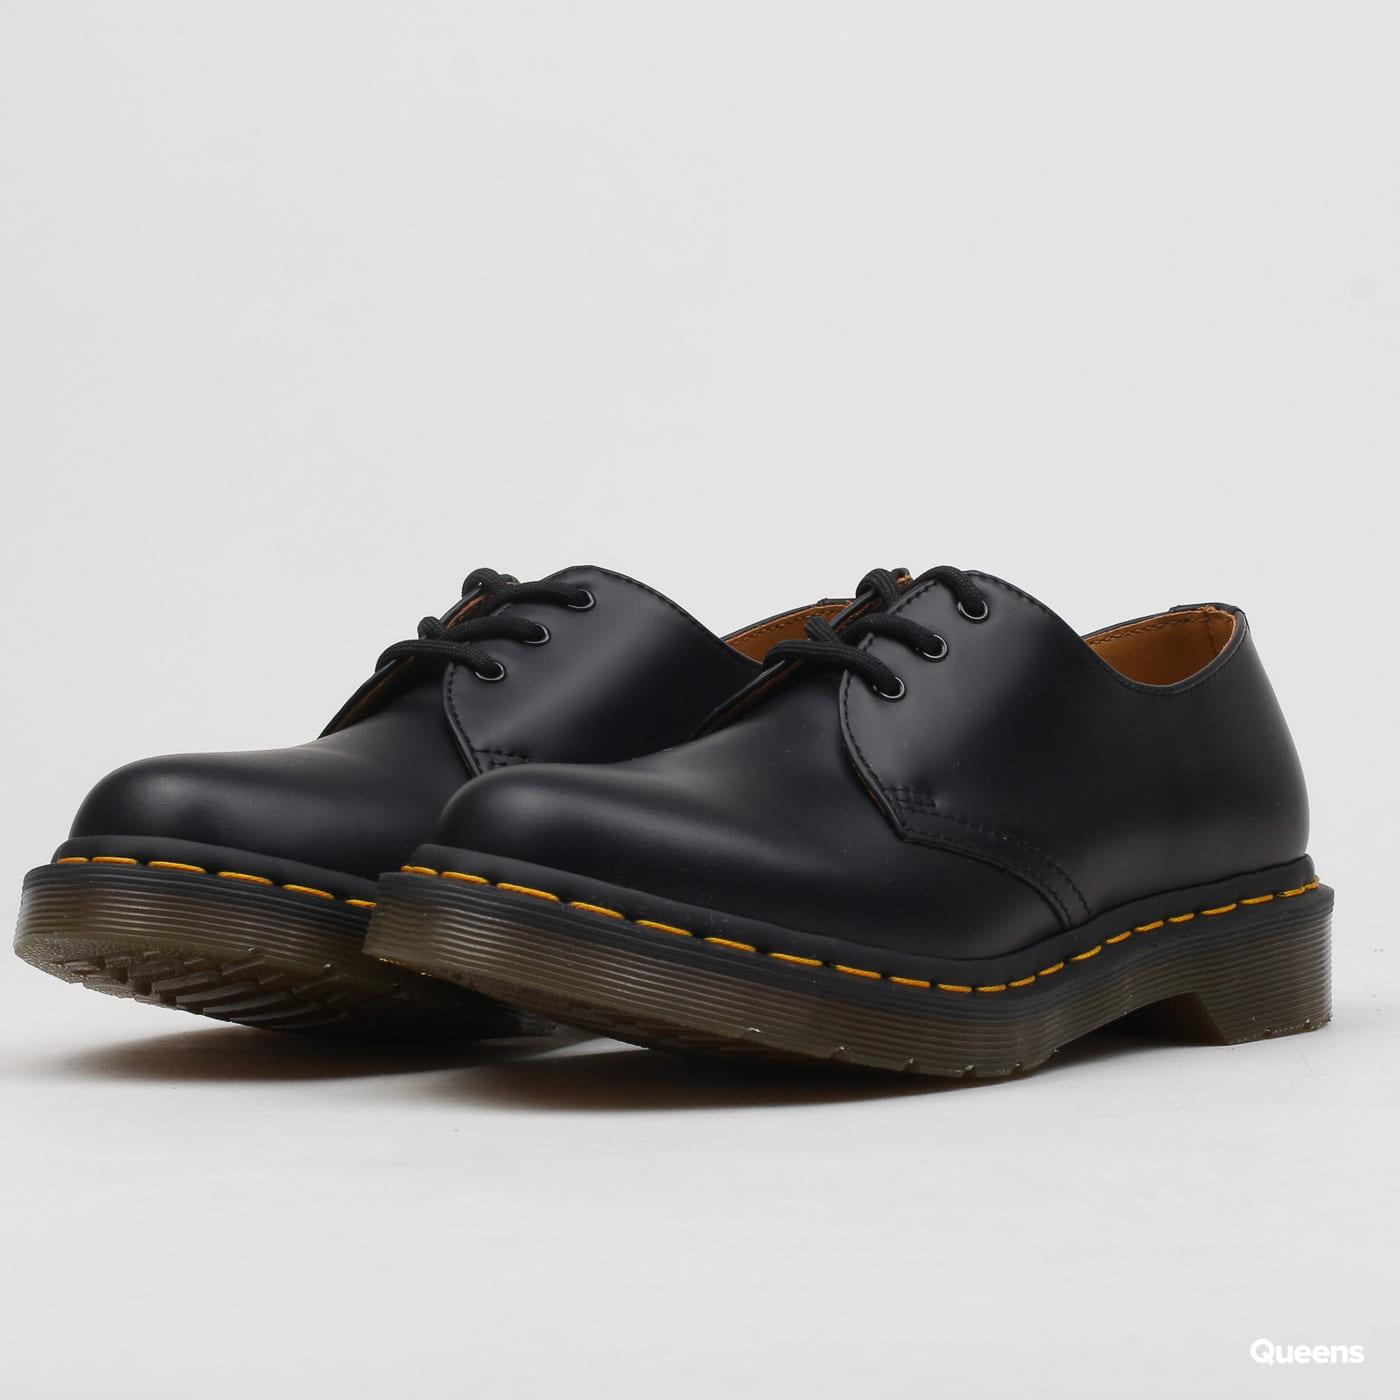 Dr. Martens 1461 W black smooth